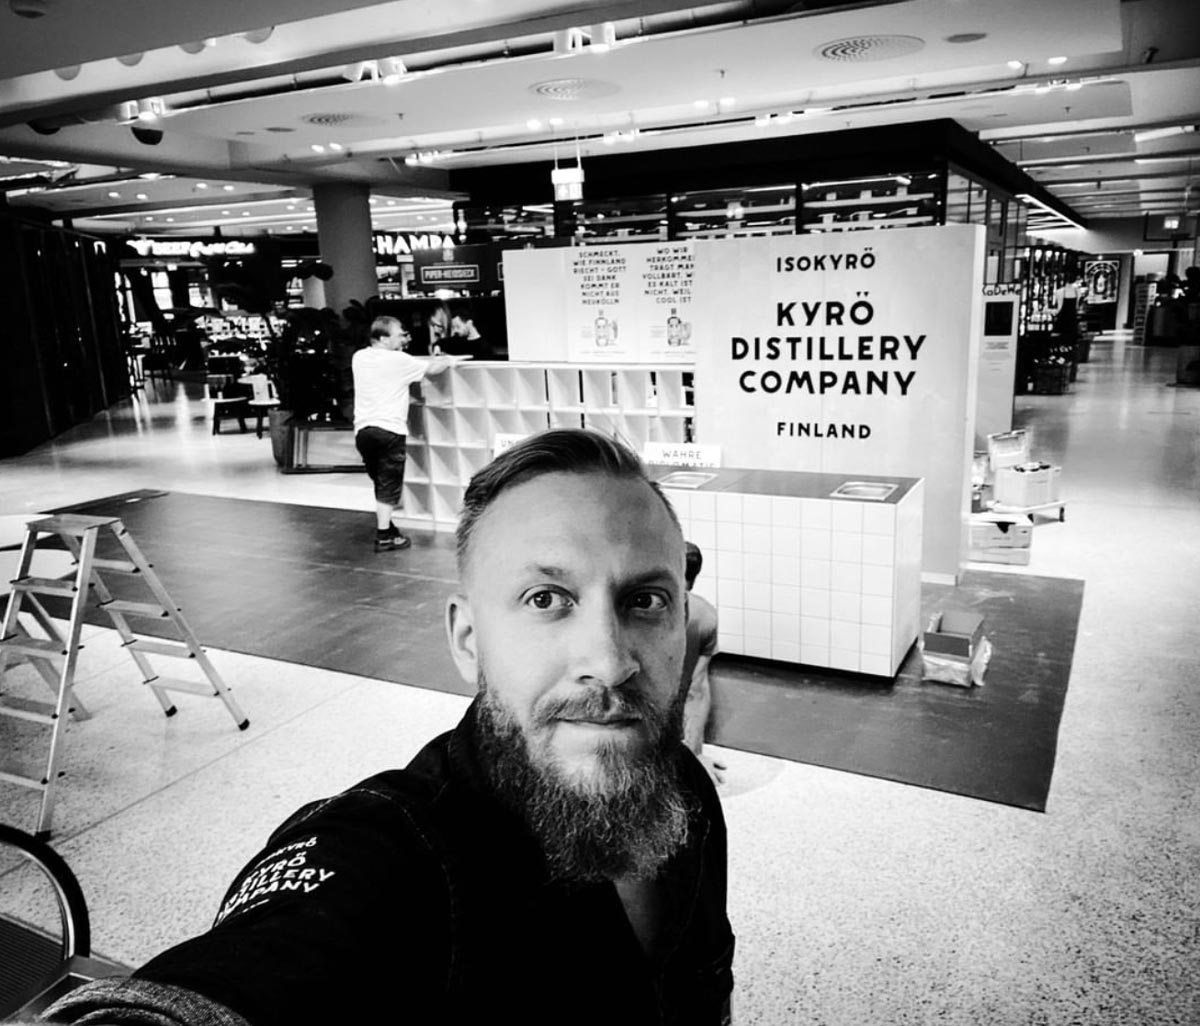 Kyrö Distillery popup bar at KaDeWe shopping mall by Framme and Tiina Rytkönen